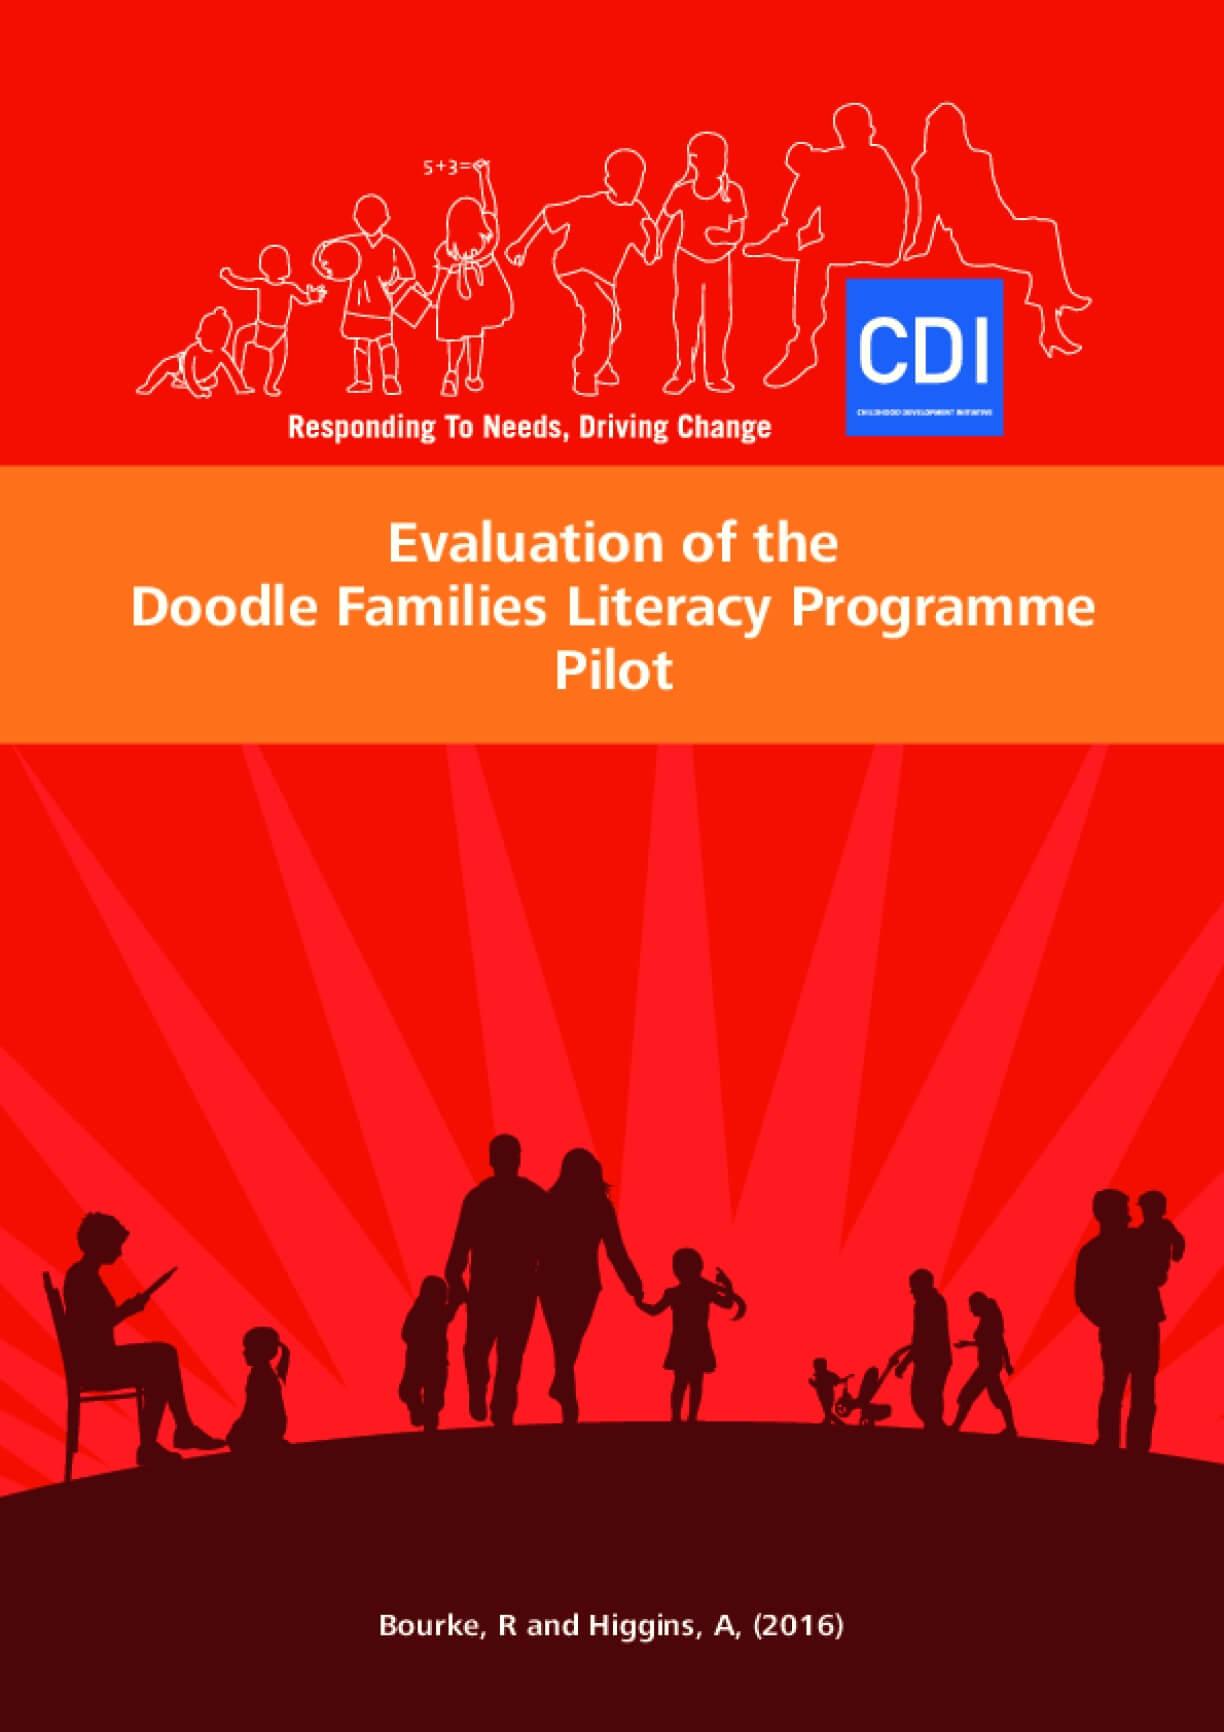 Evaluation of the Doodle Families Literacy Programme Pilot